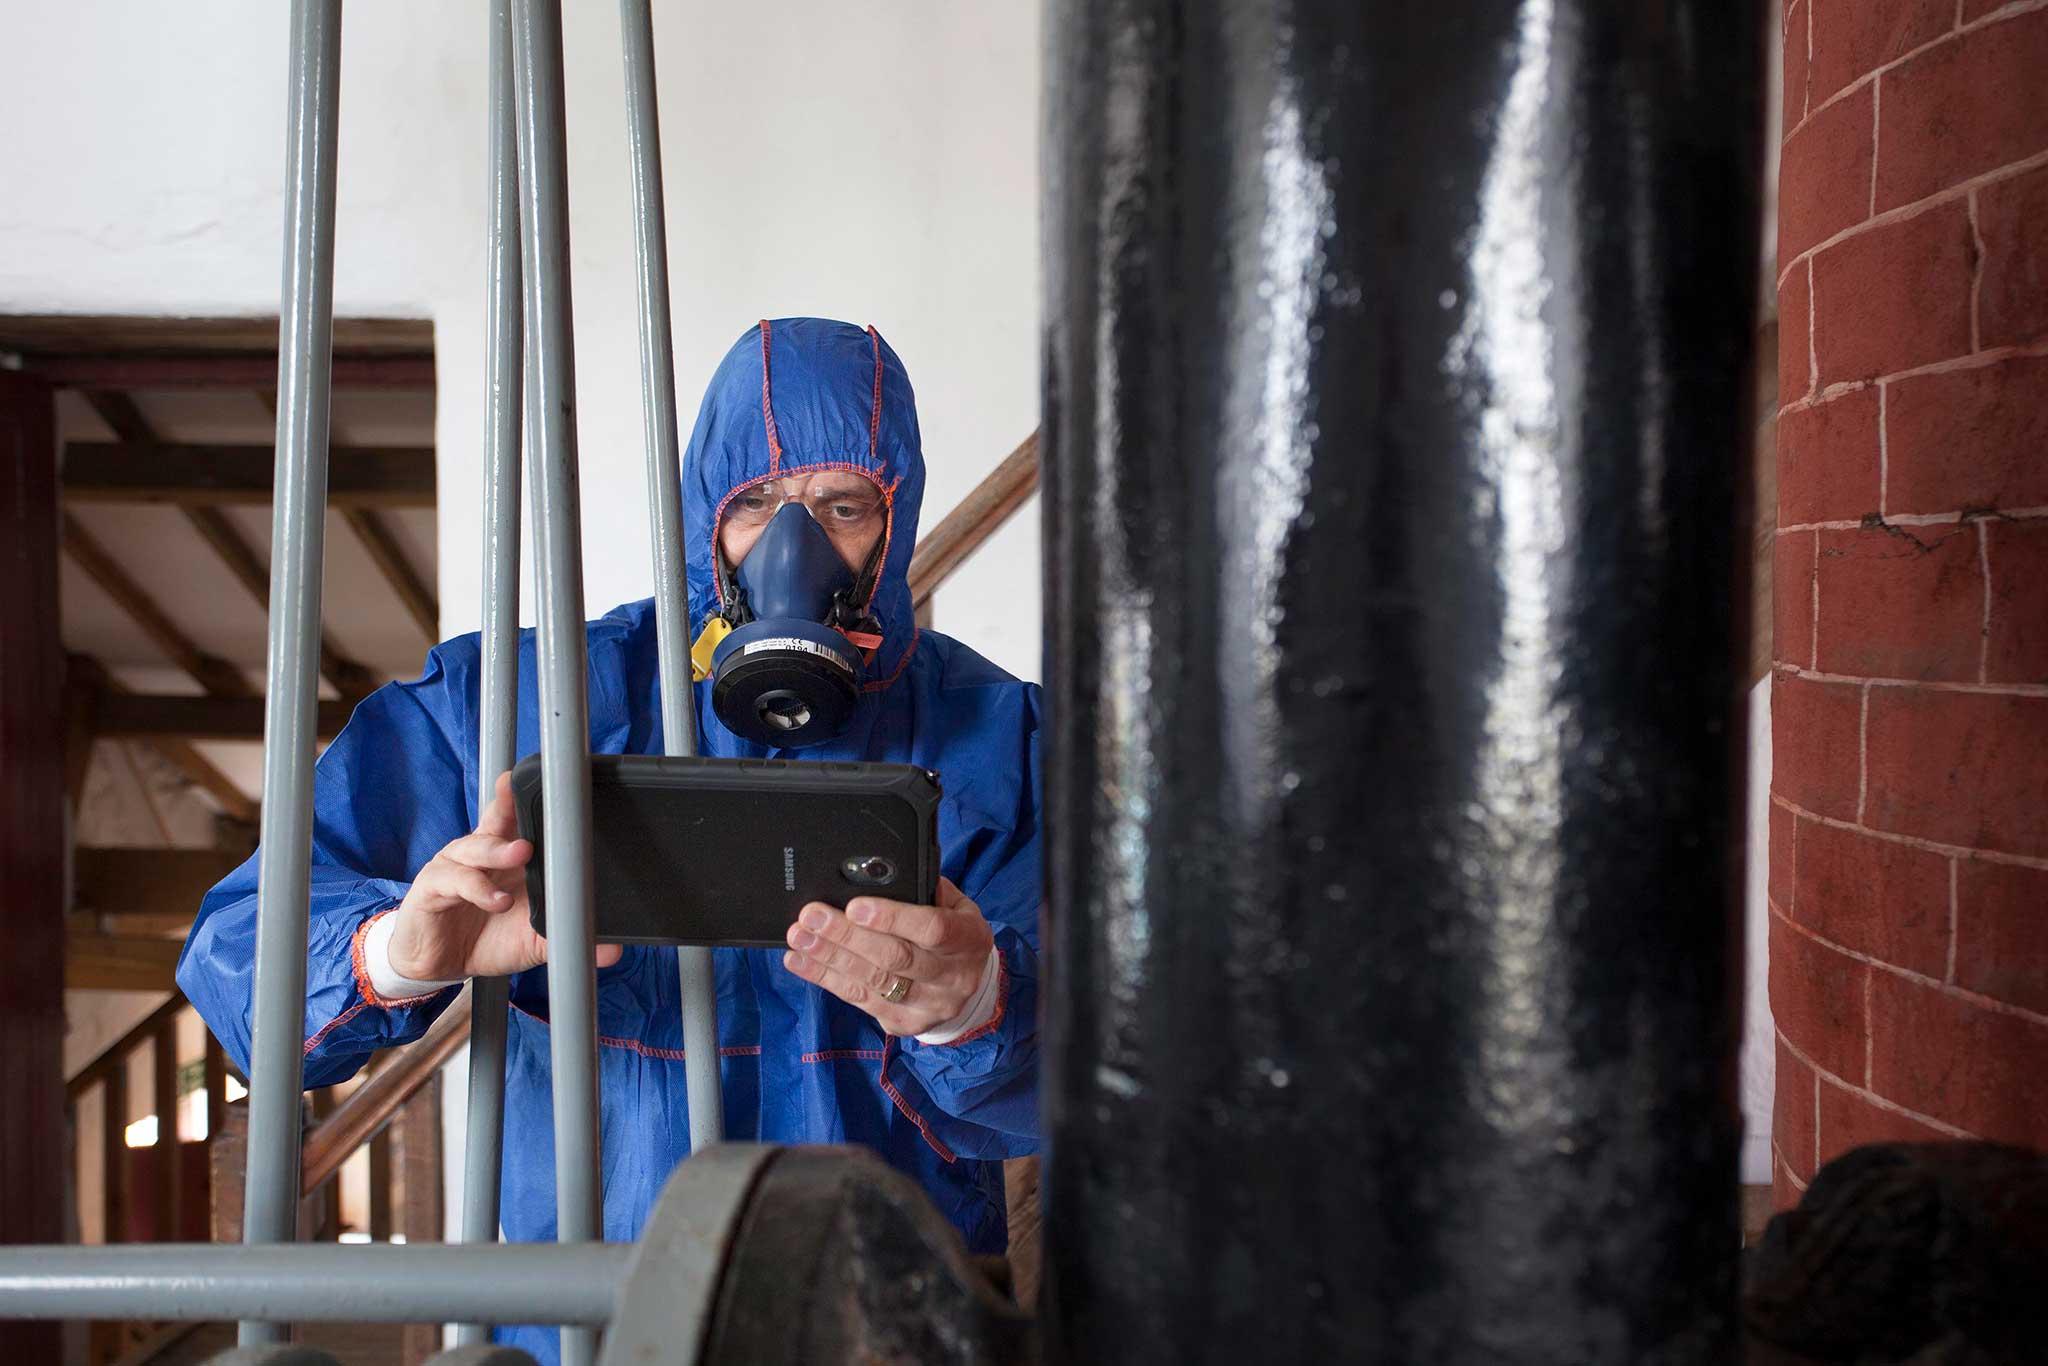 Allium surveyor testing an old door for lead paint